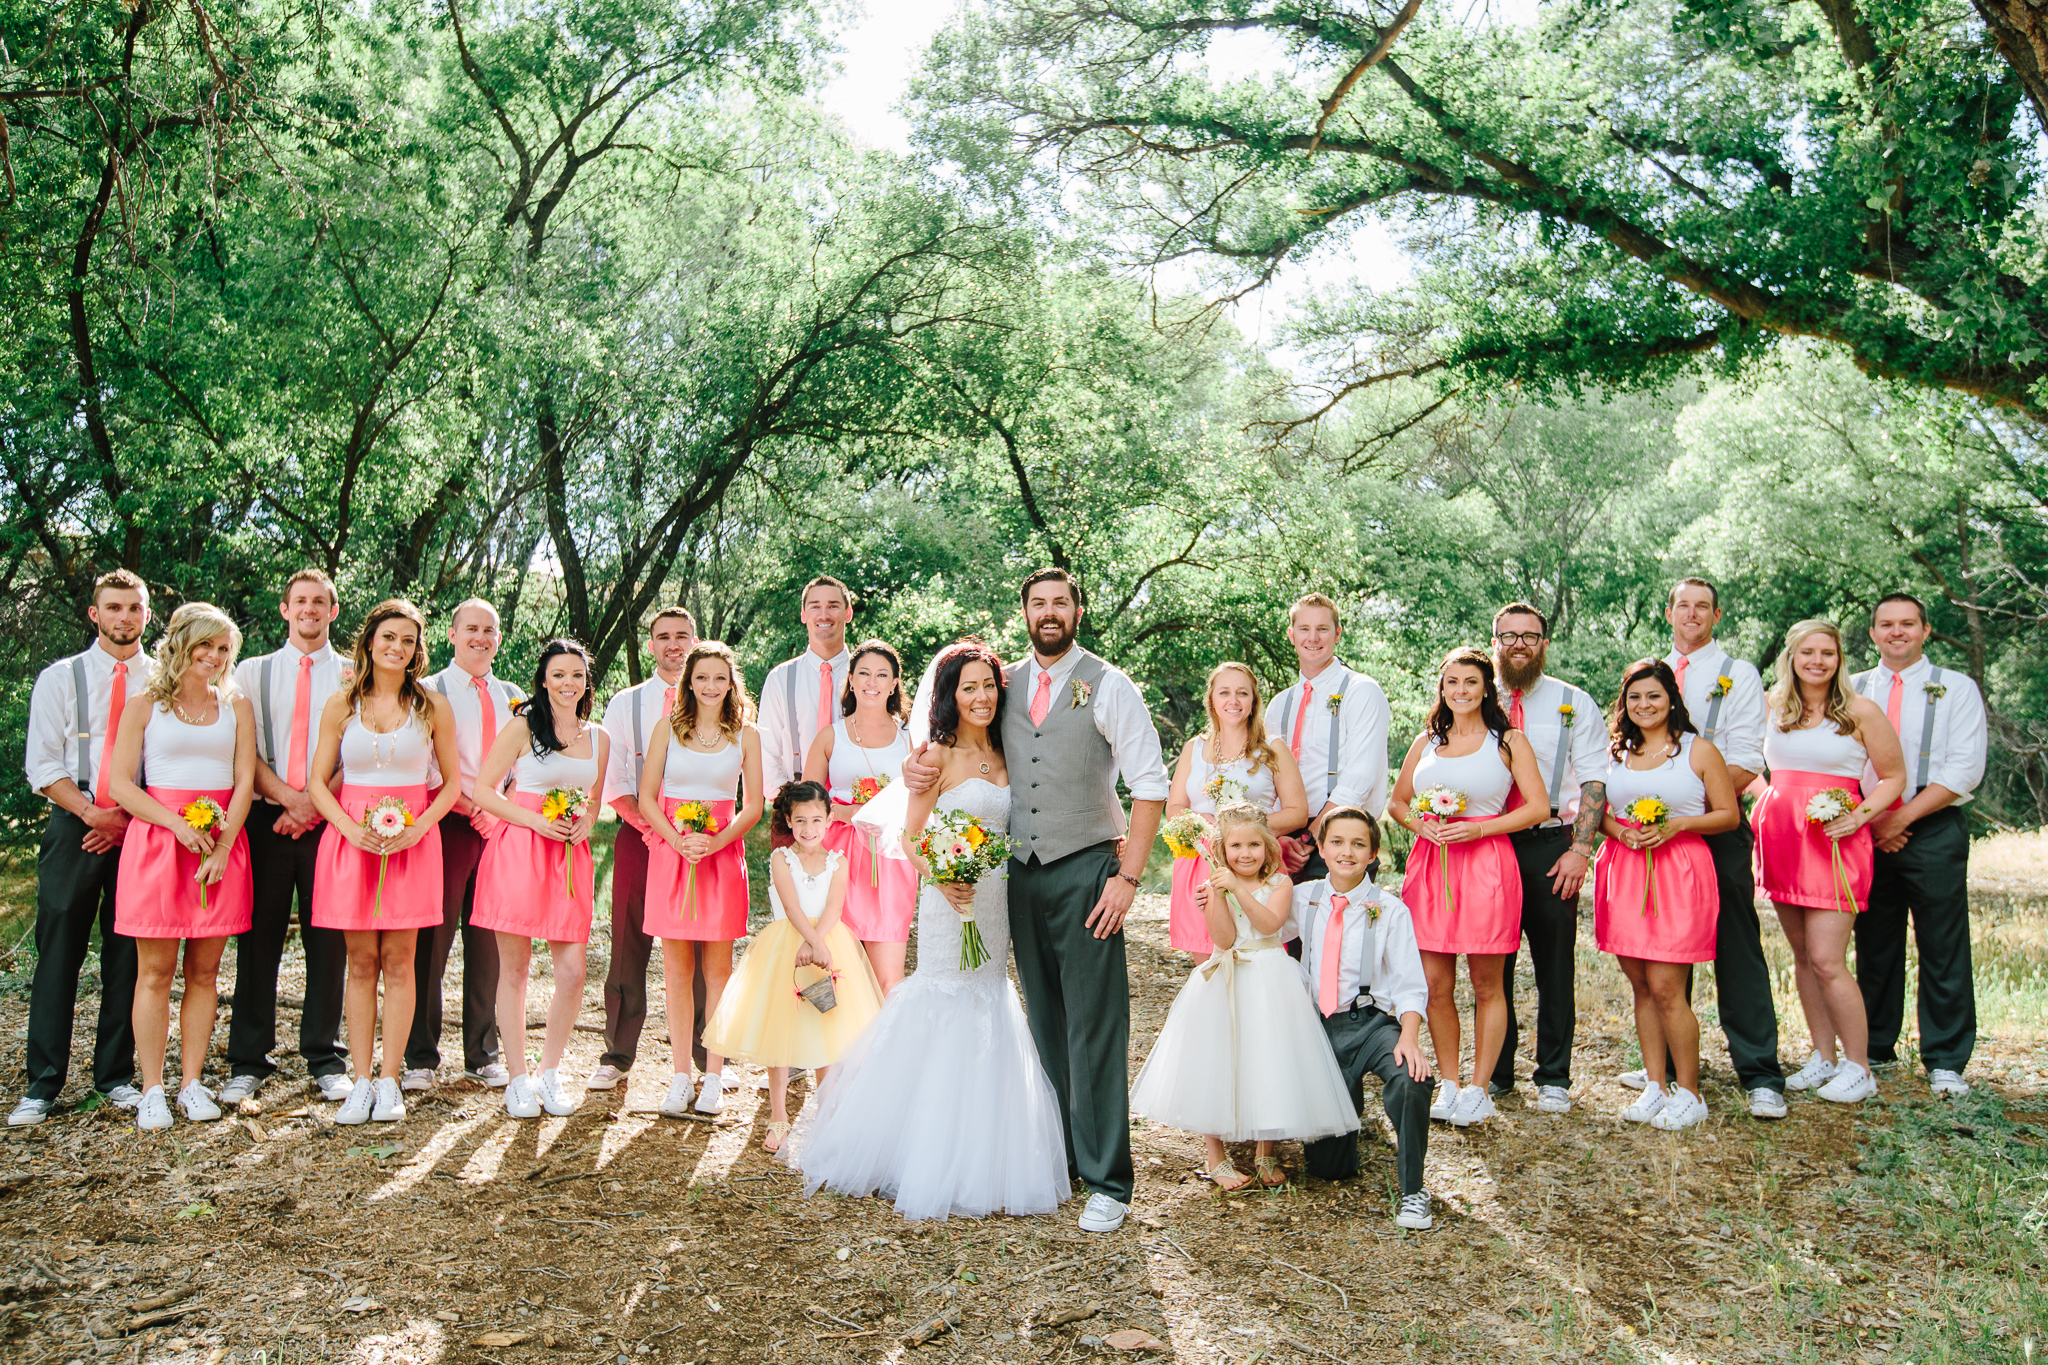 Prescott-Wedding-Photographer-2105.jpg